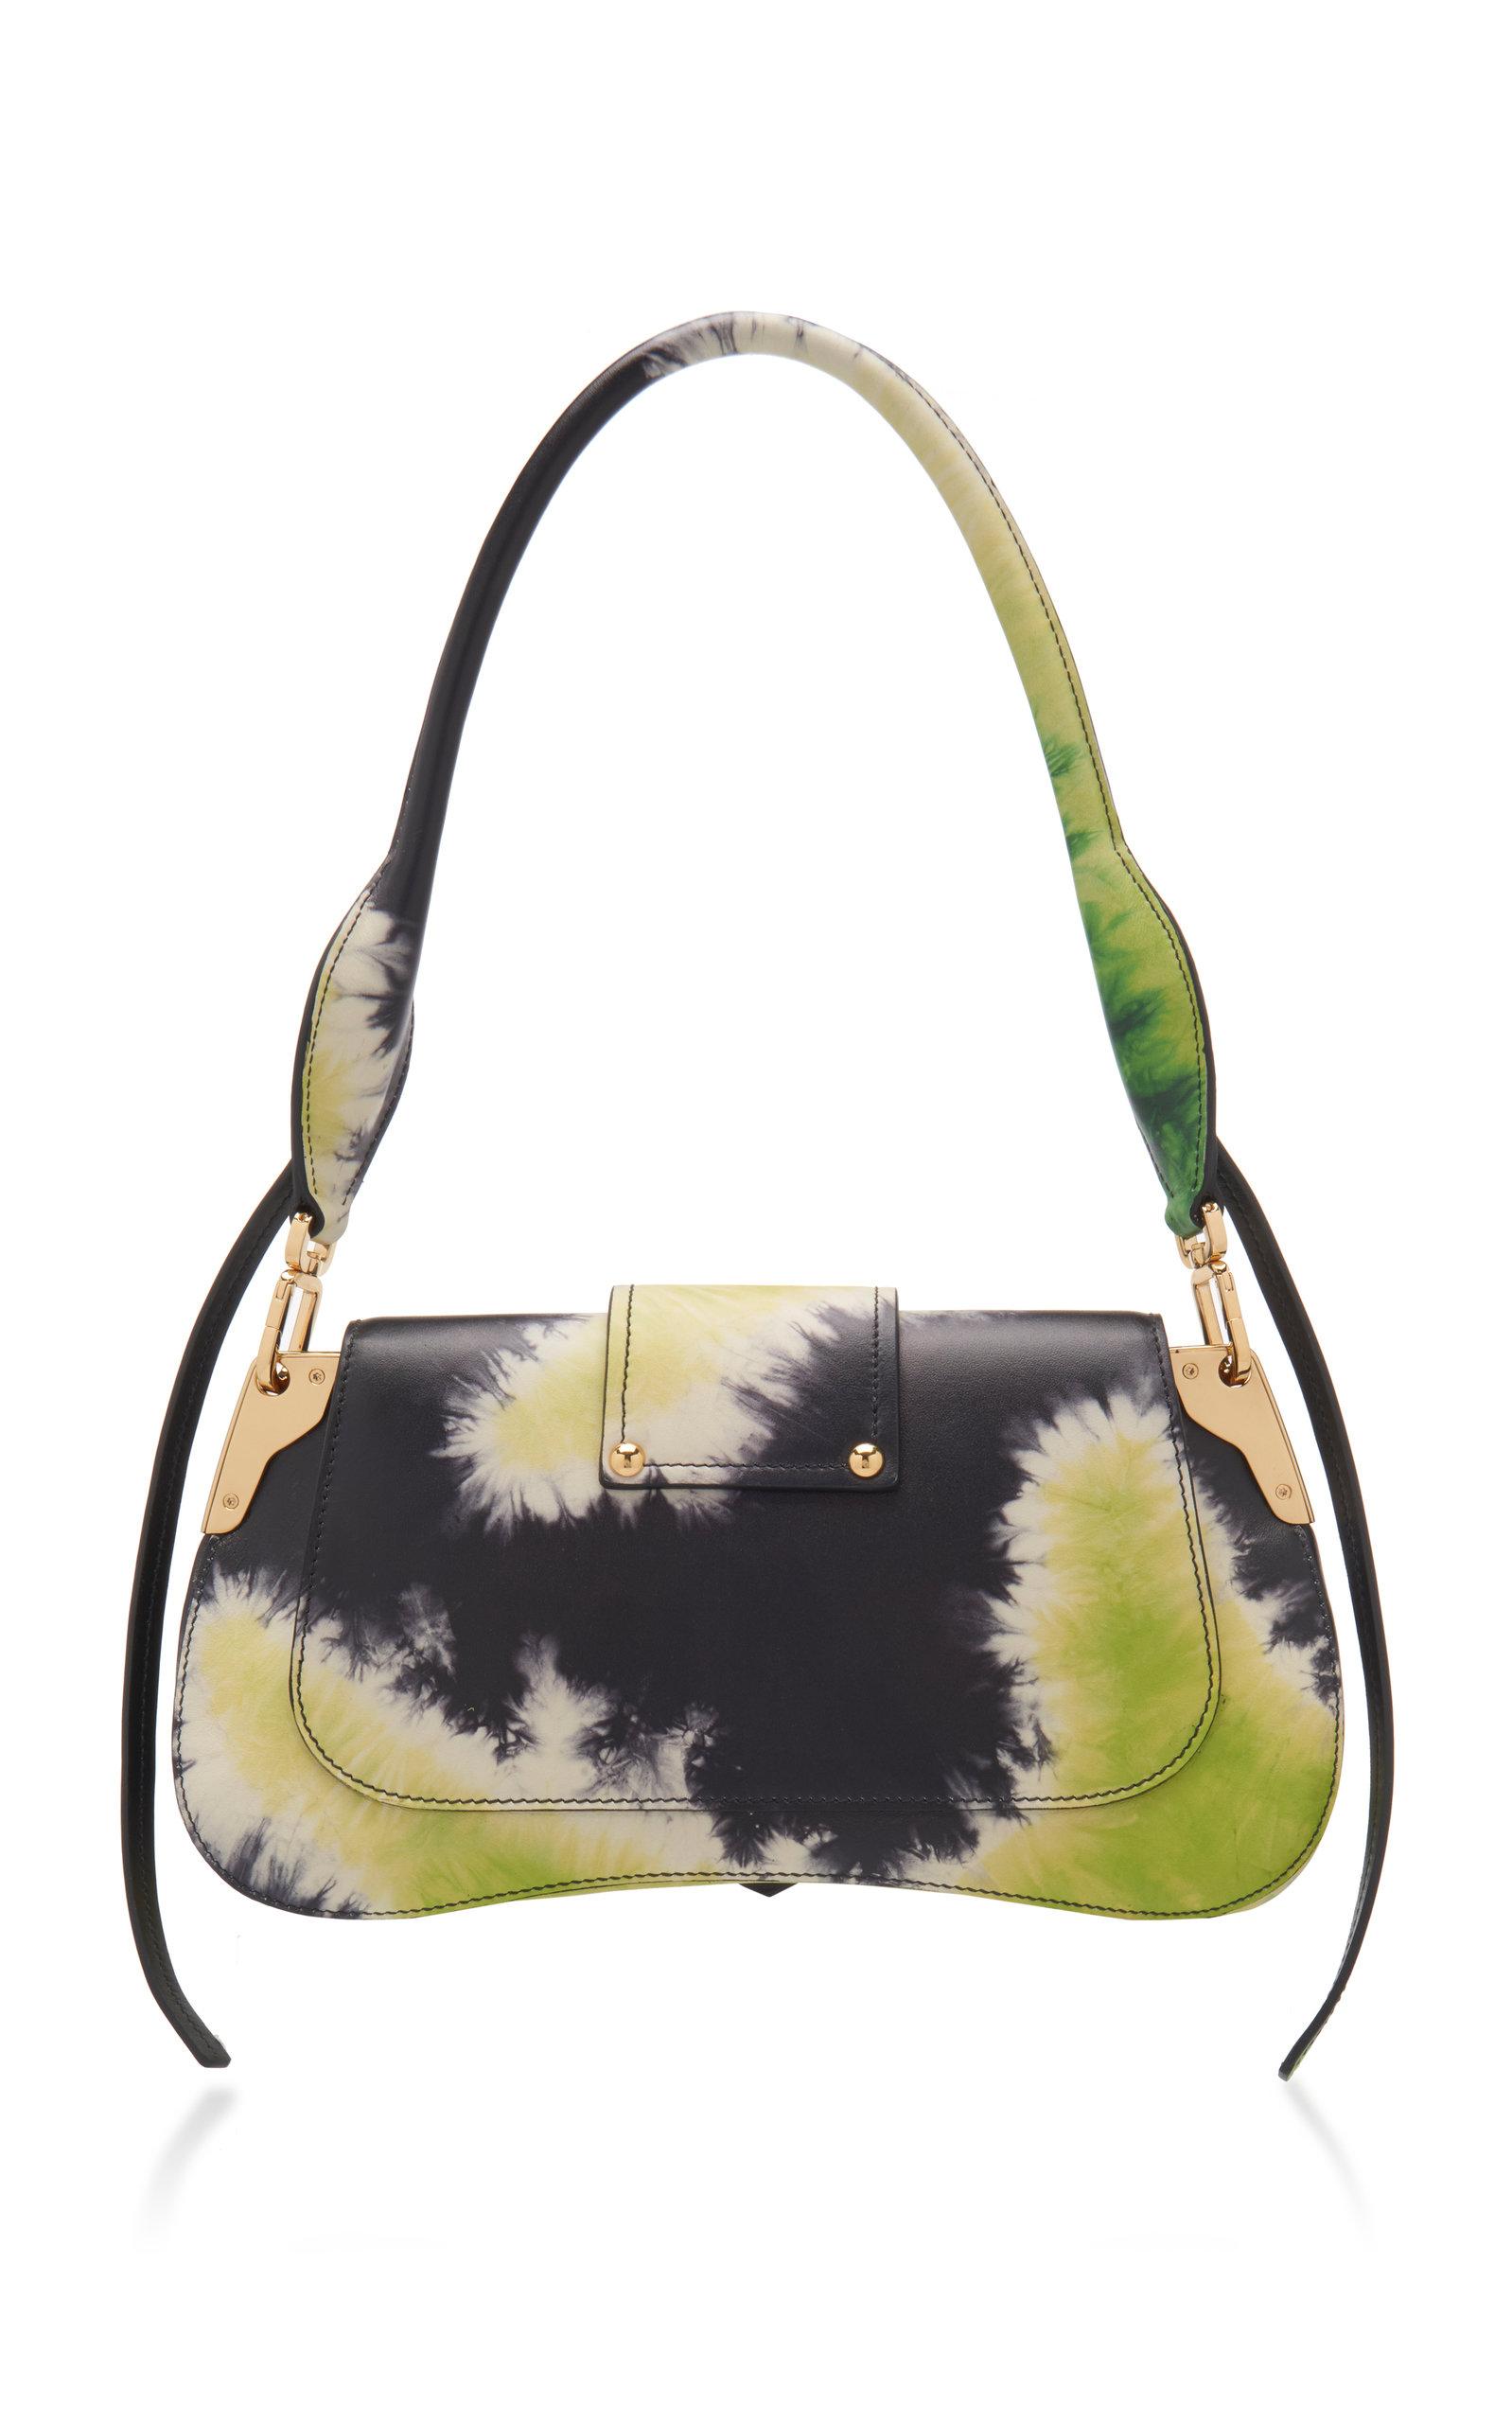 880e986f Pattina Tie-Dye Leather Shoulder Bag